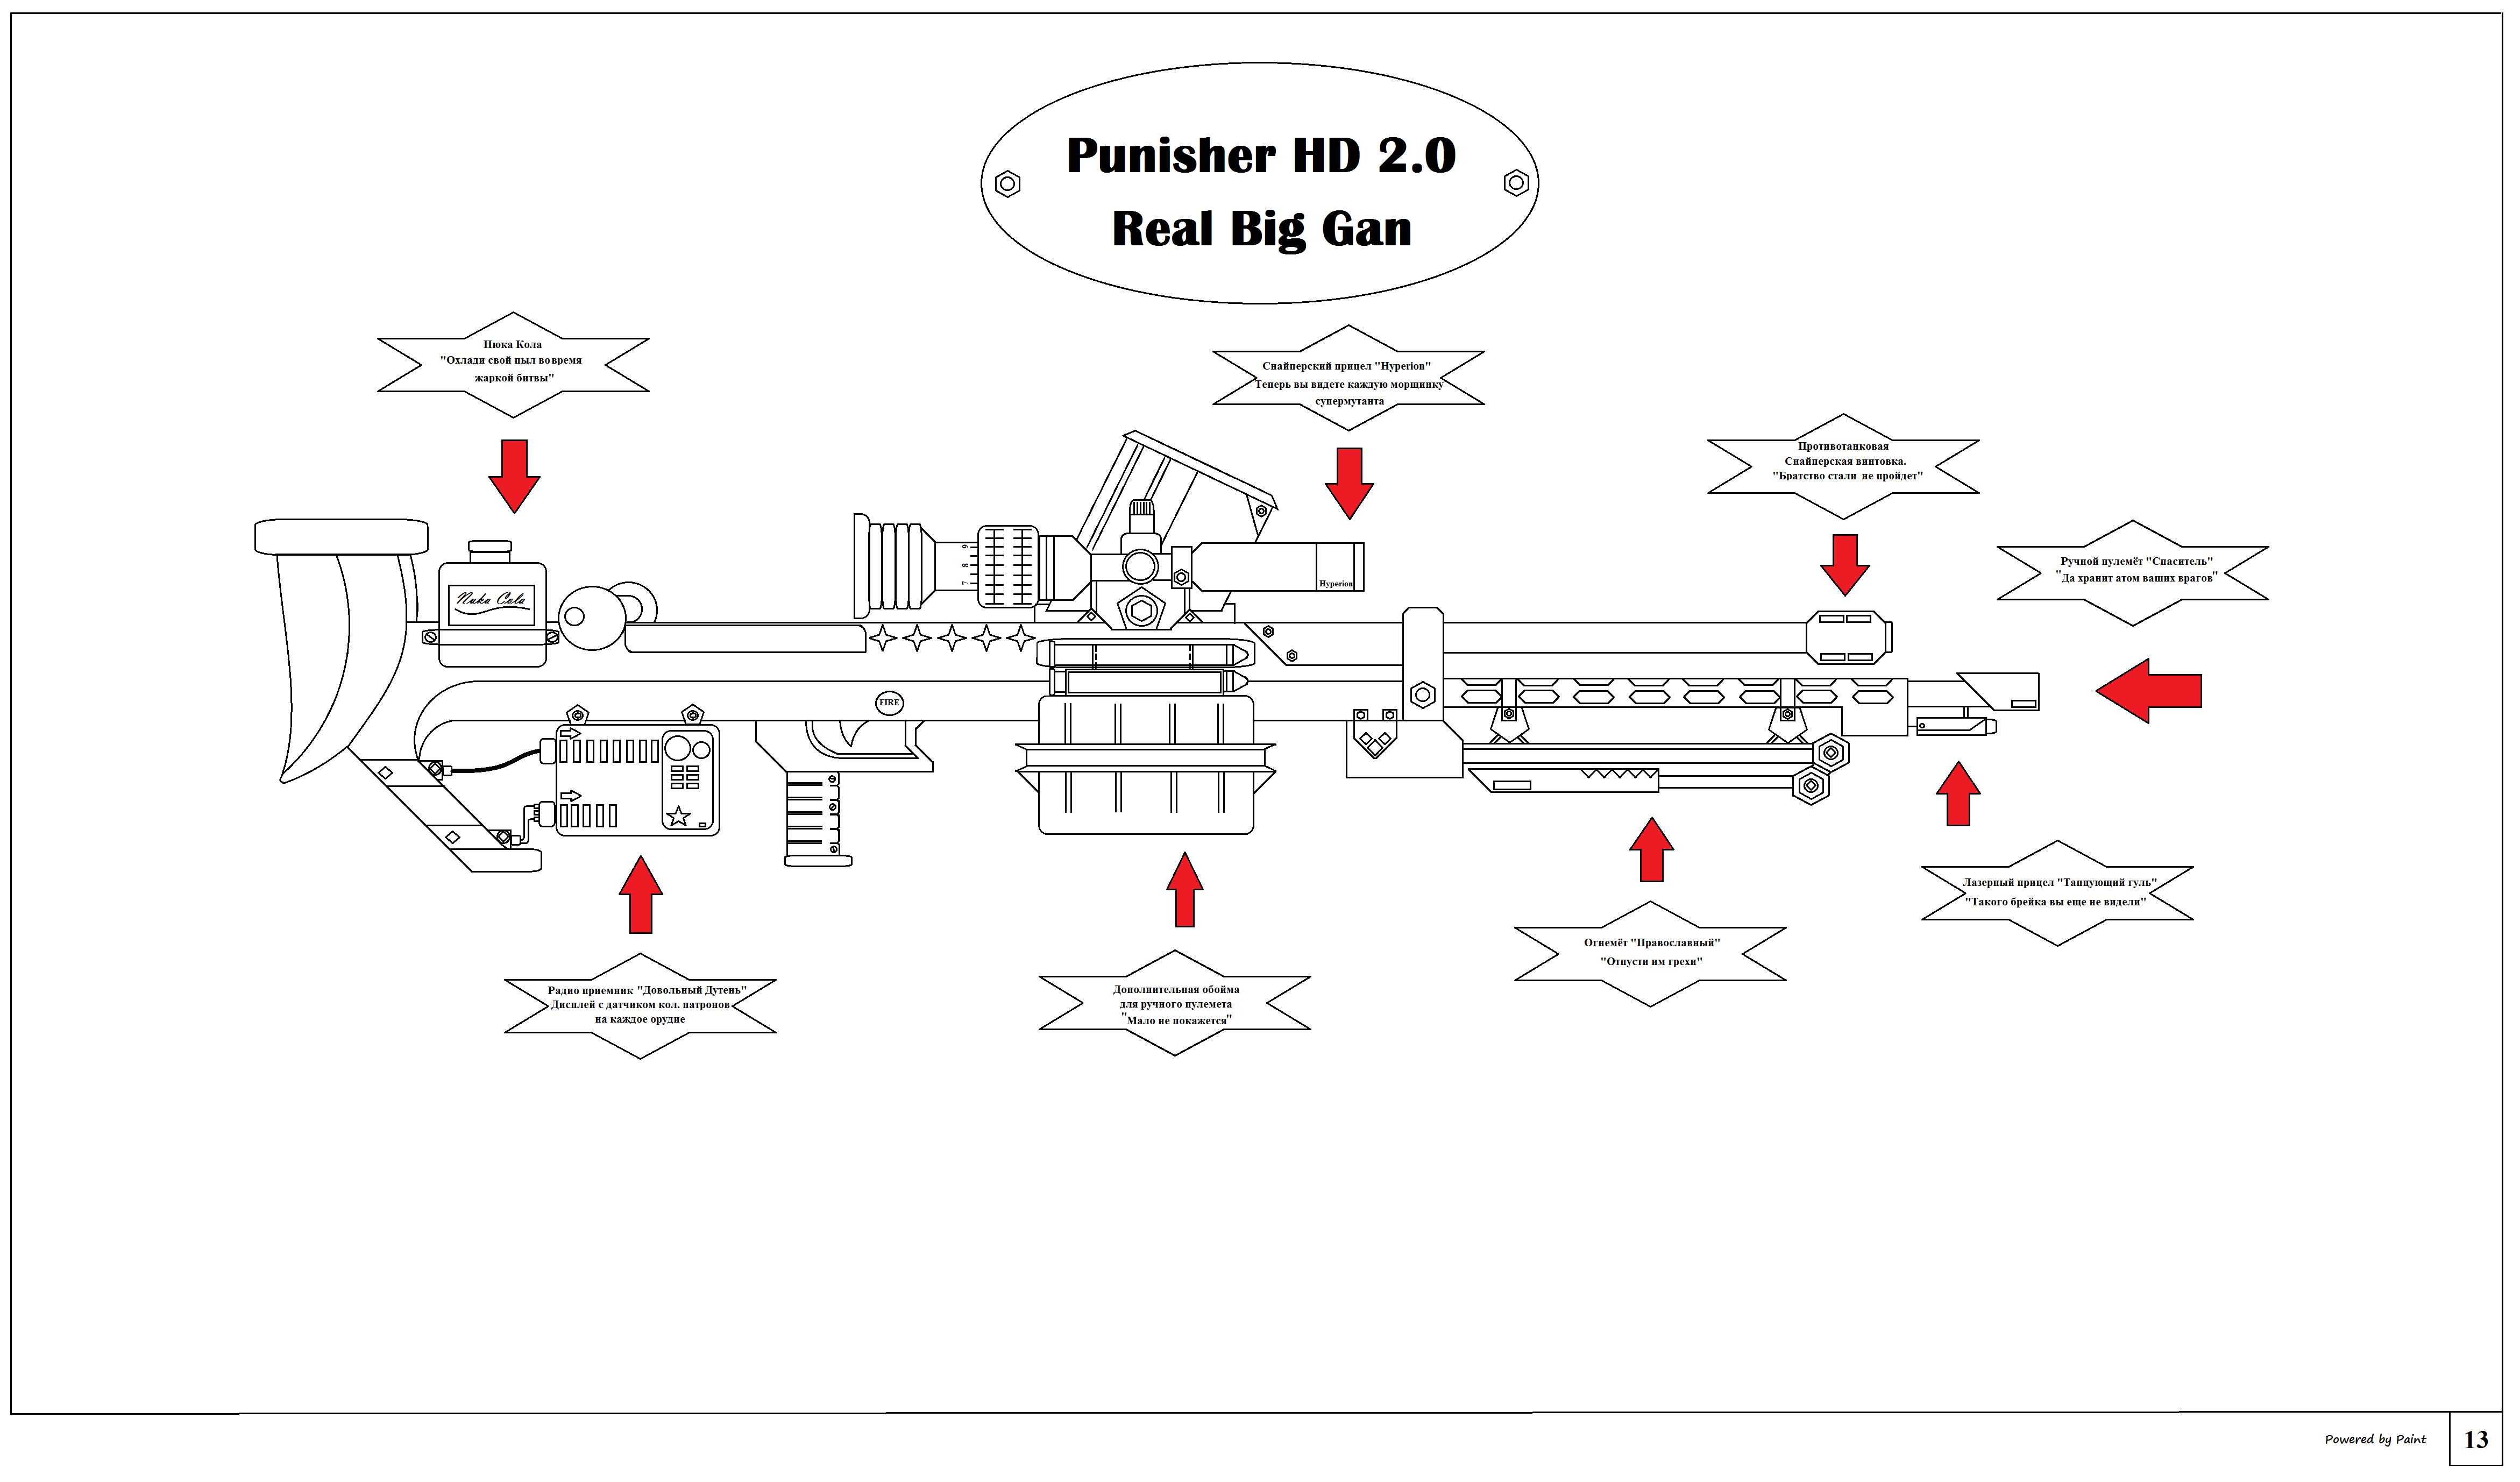 Punisher HD 2.0 - Изображение 2